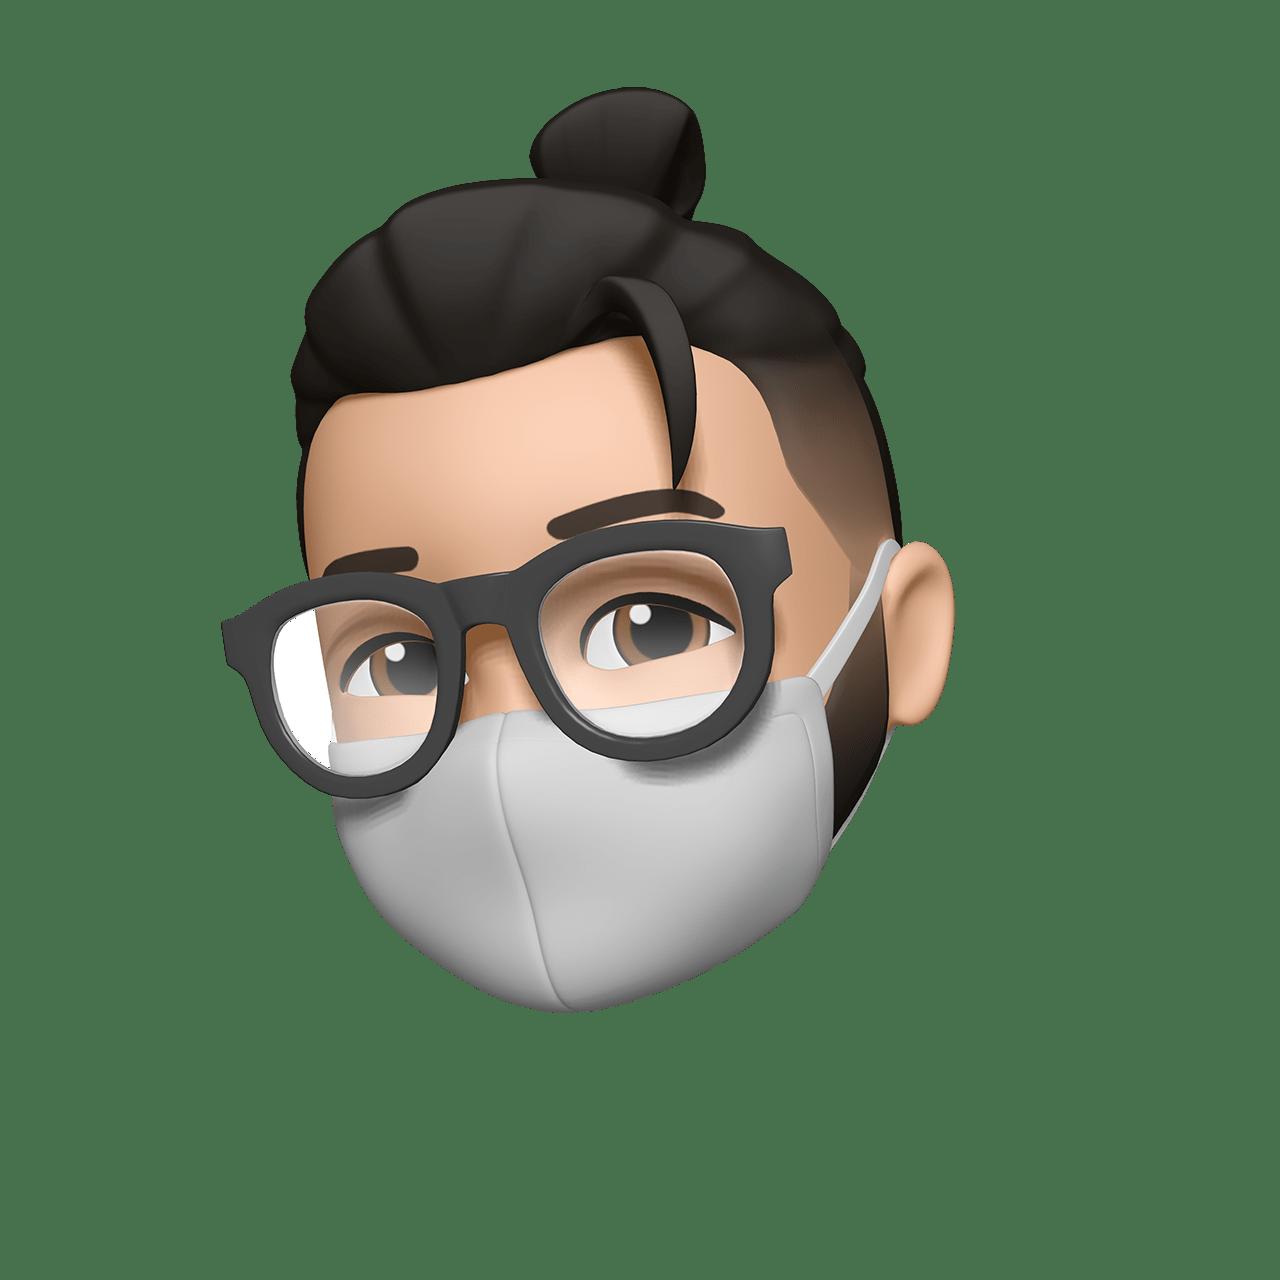 apple emoji memoji update iphone ipad watch face masks bubble tea tamale transgender symbol